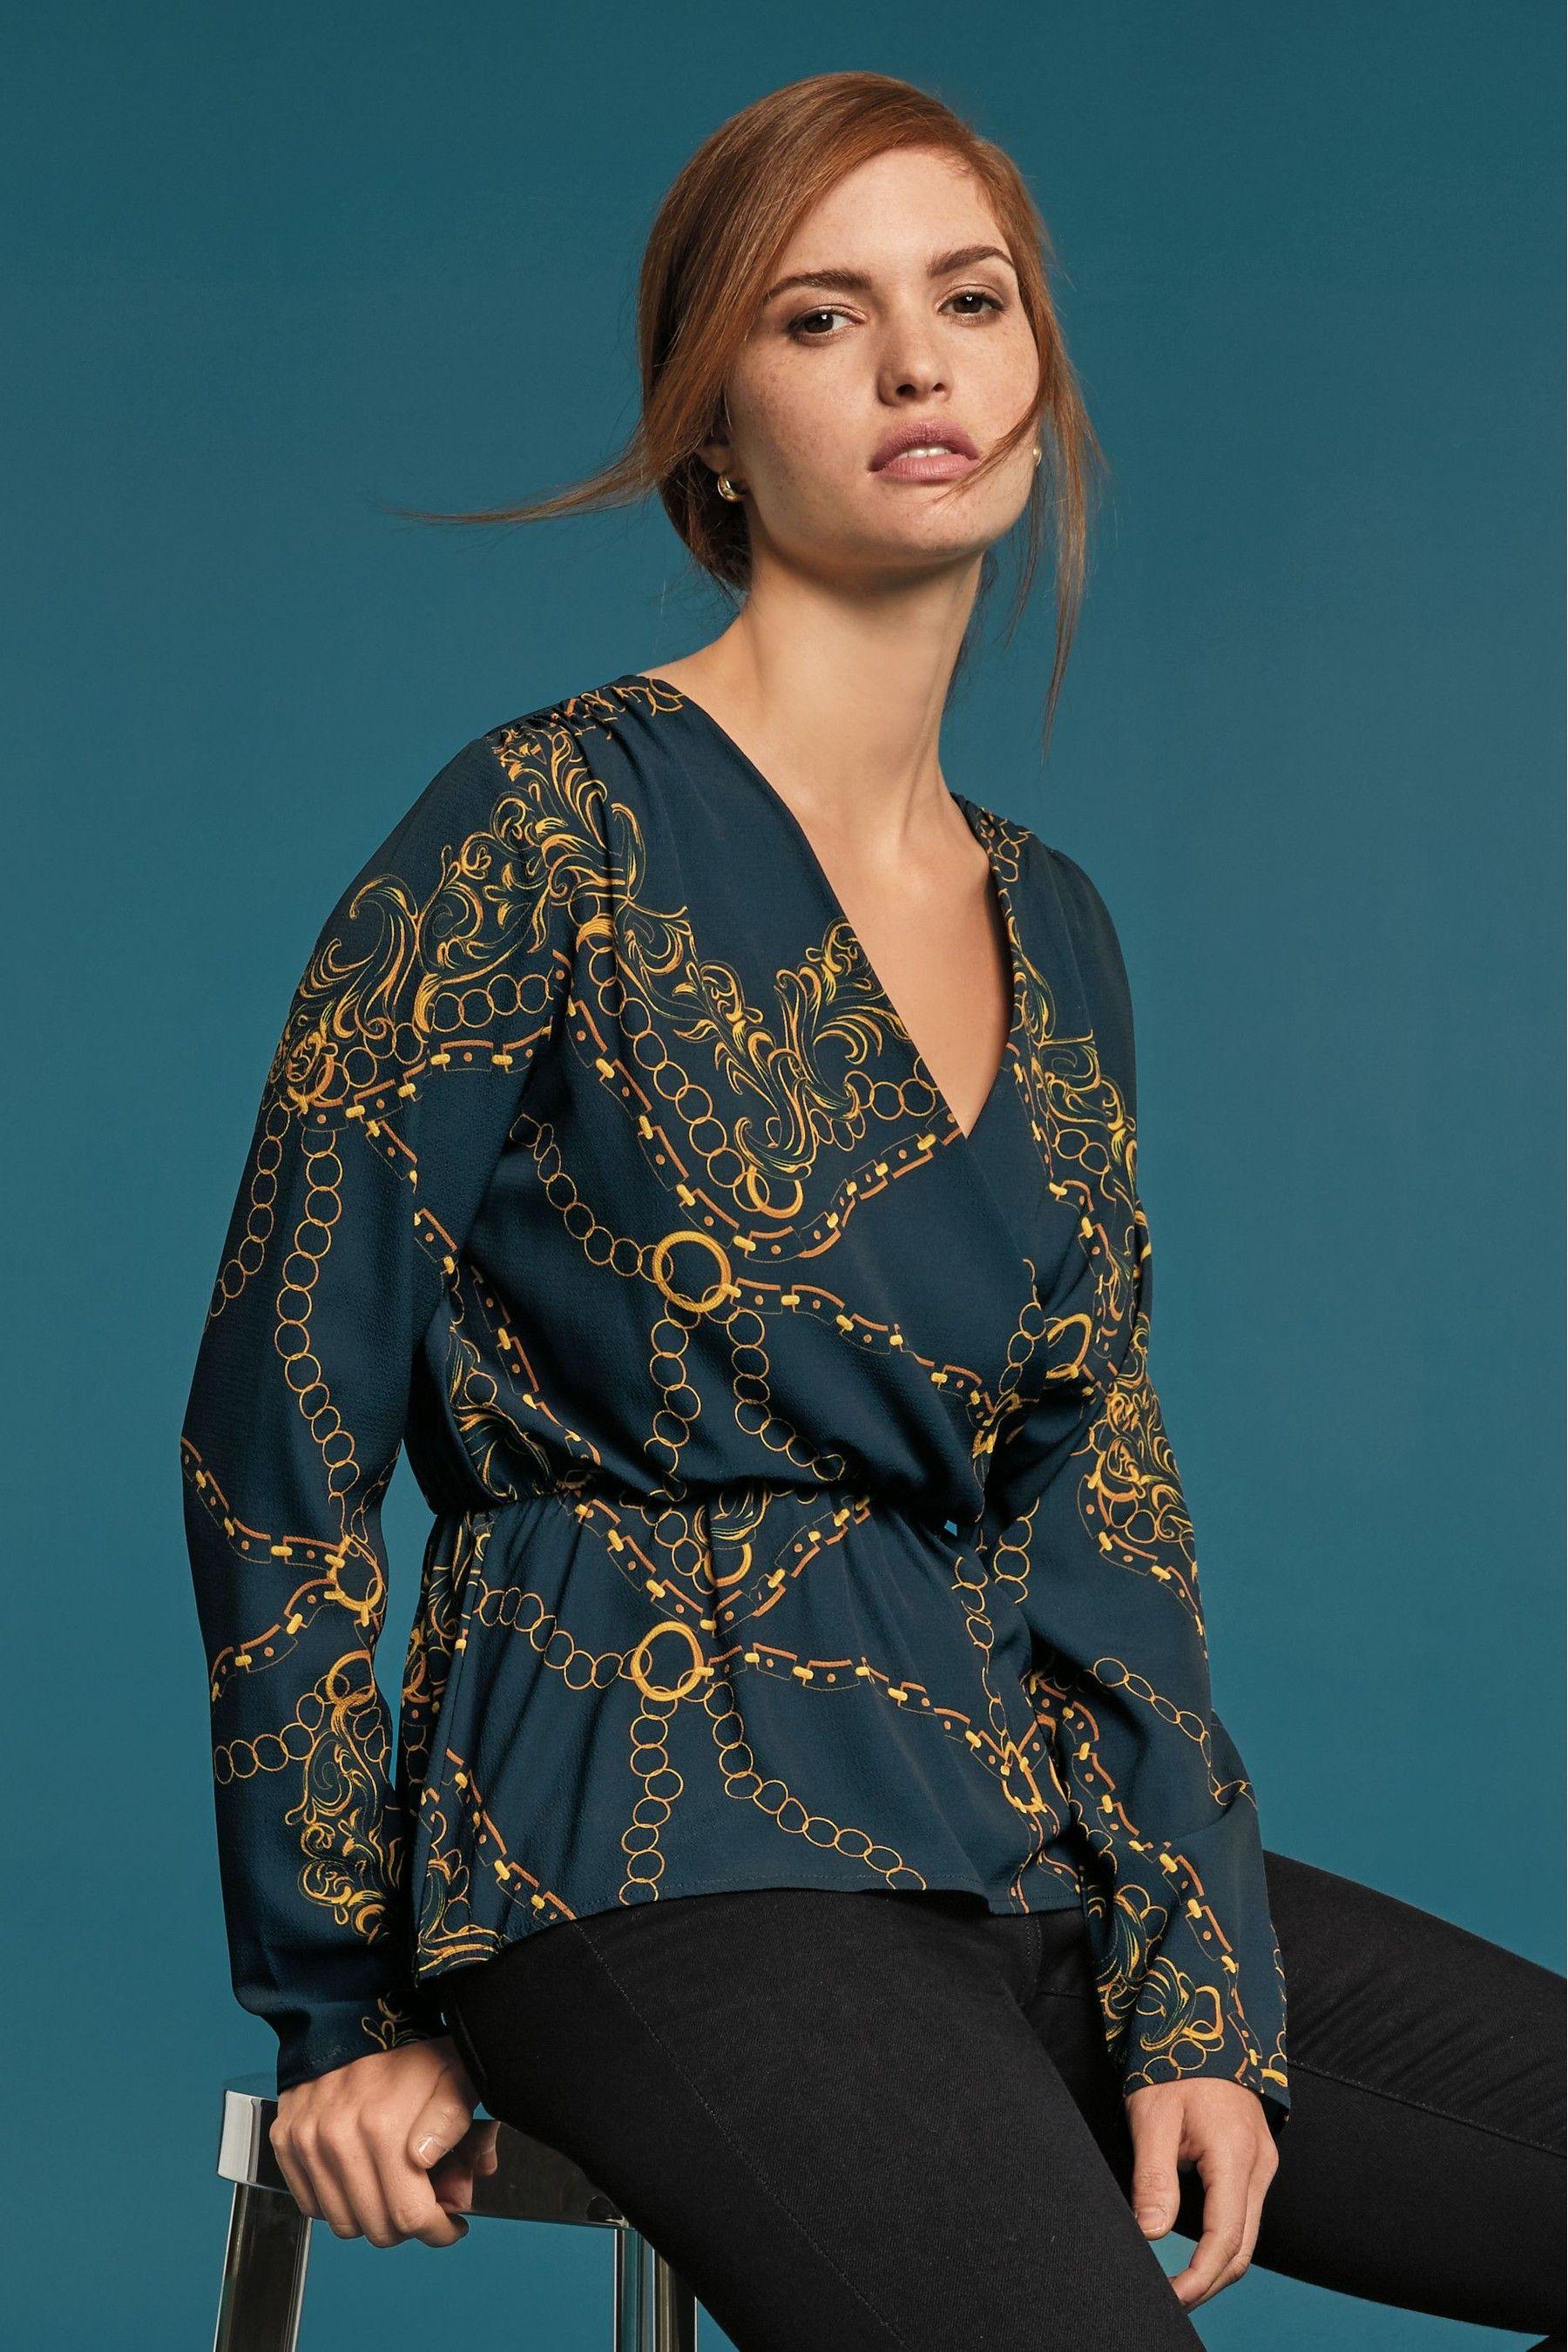 db9e94a03411 Womens Next Navy Chain Print Wrap Top - Blue | Products | Black ...